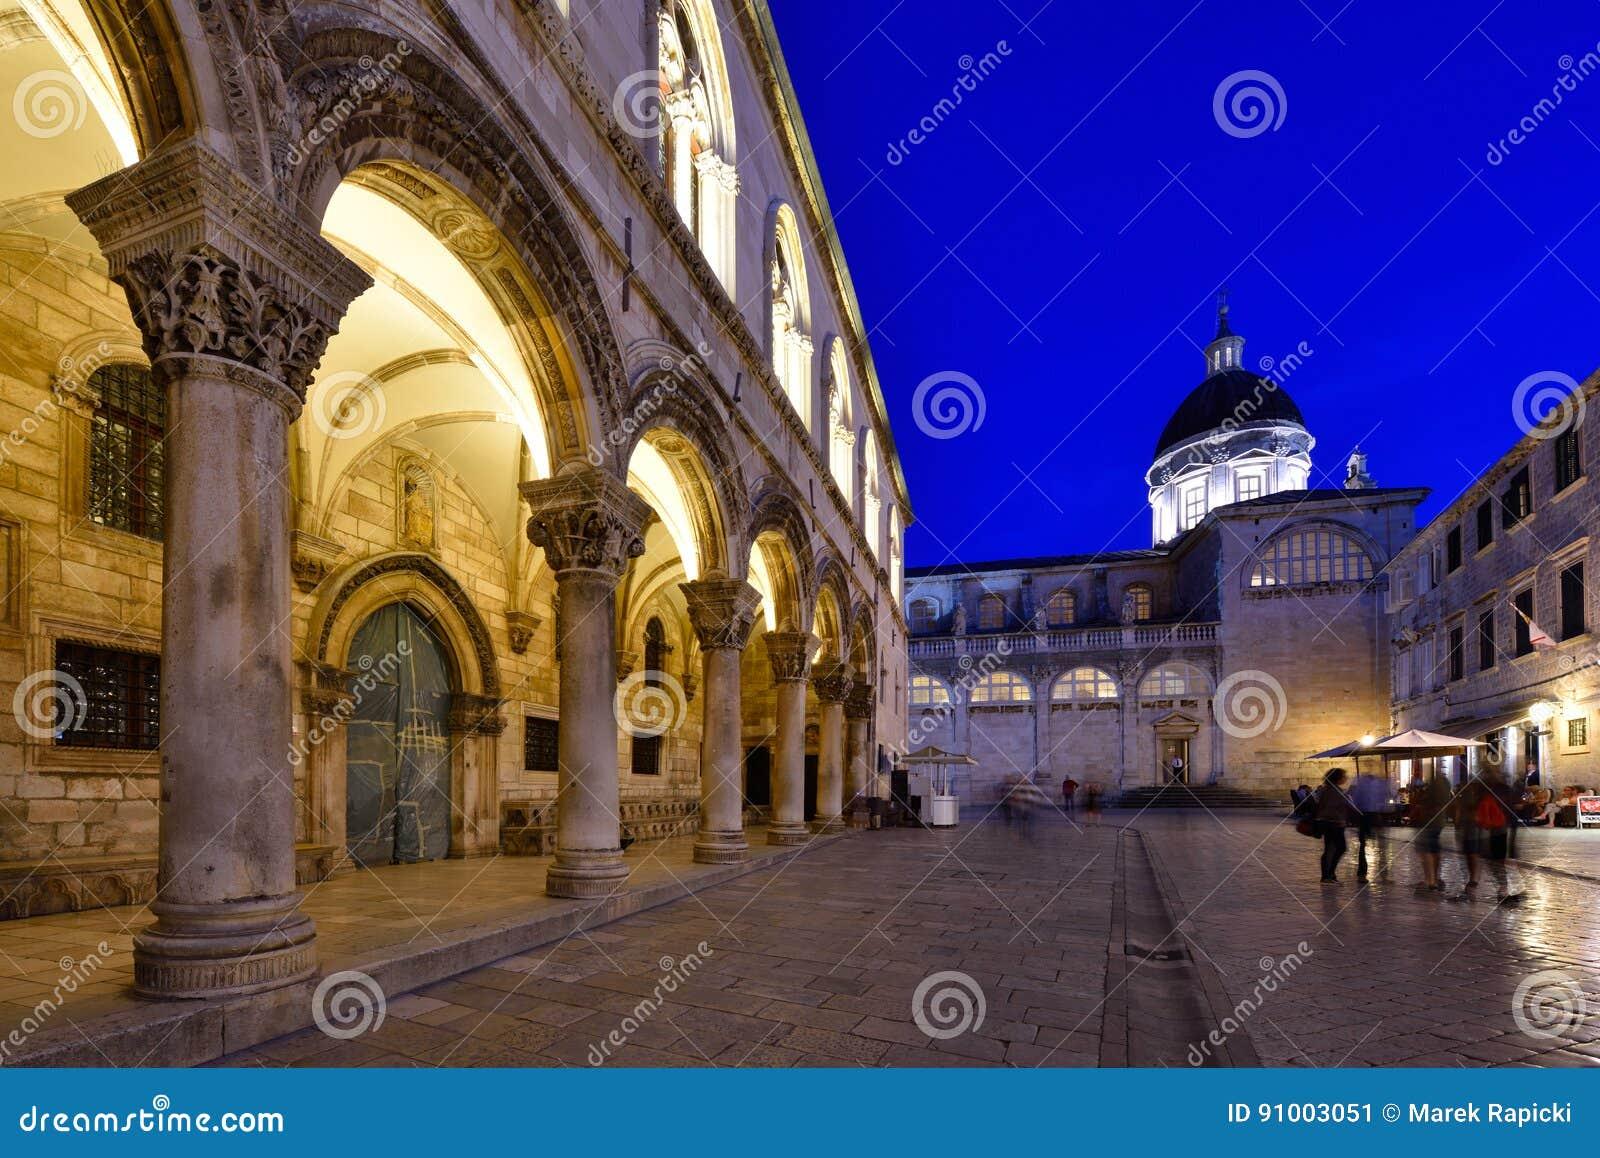 Alte Stadt DUBROVNIKS, KROATIEN - Dubrovniks